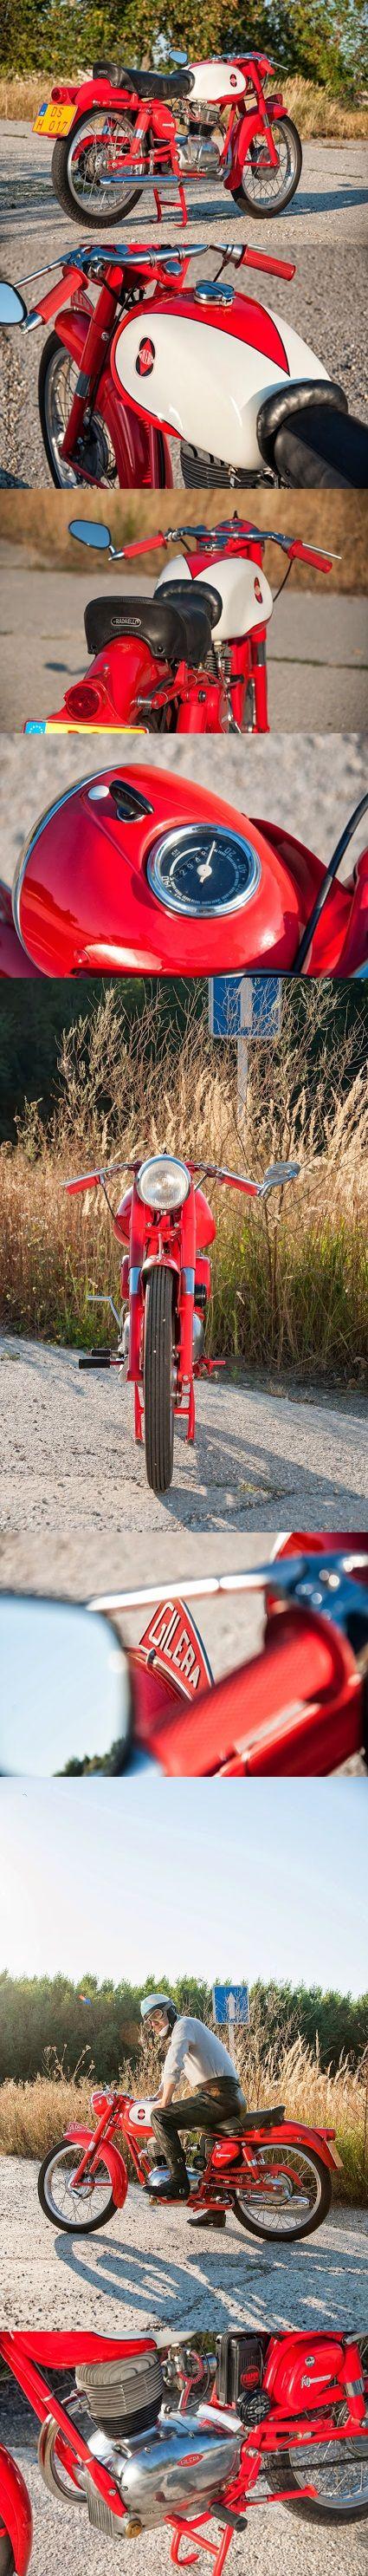 Gilera Rossa Super 150